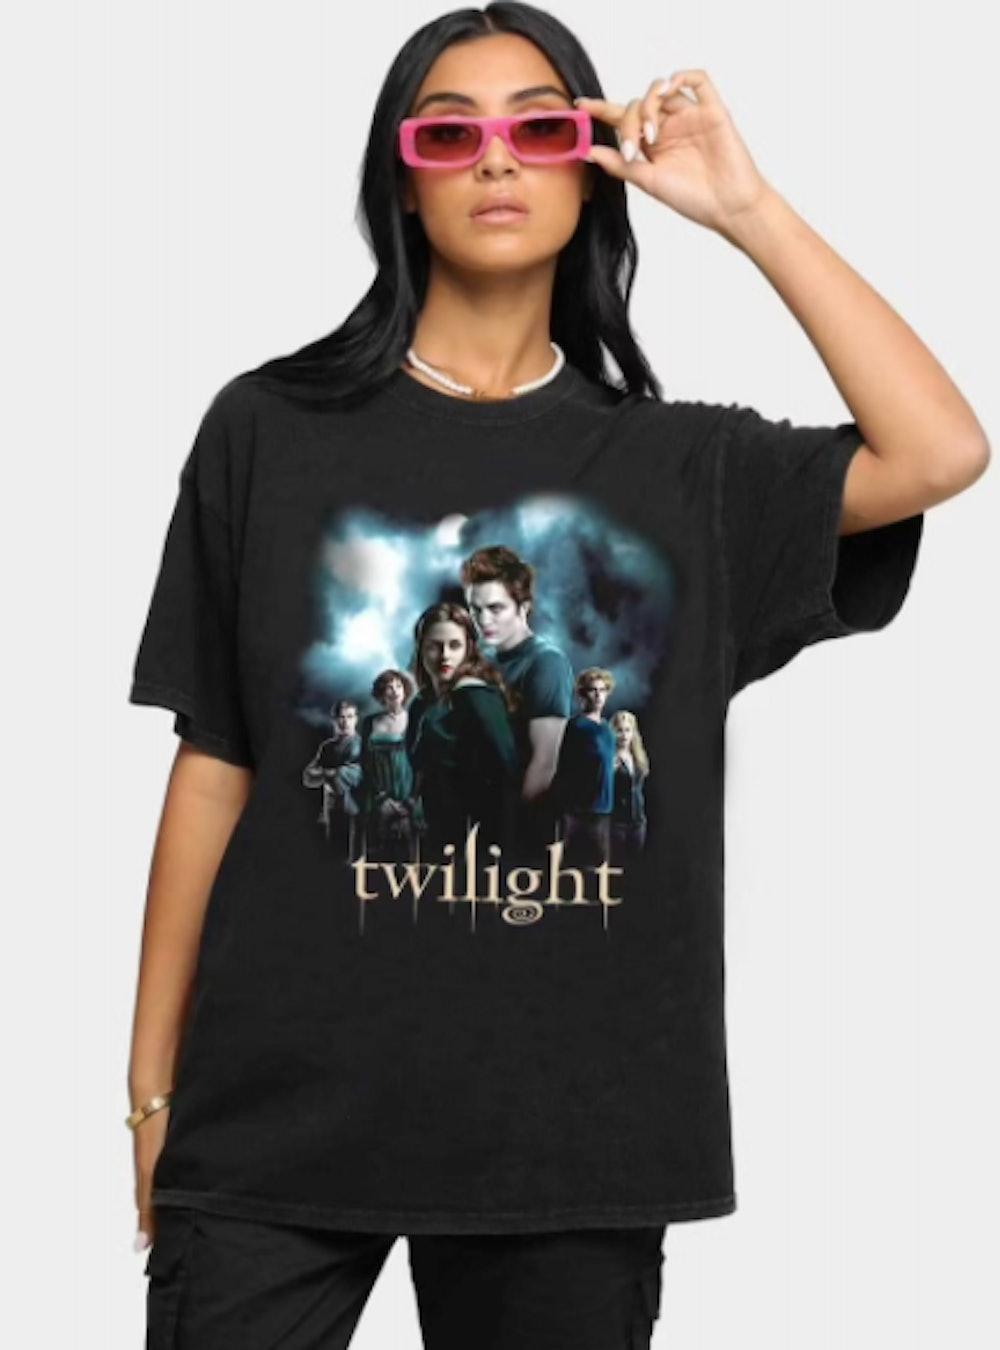 Twilight Saga Movie Shirt